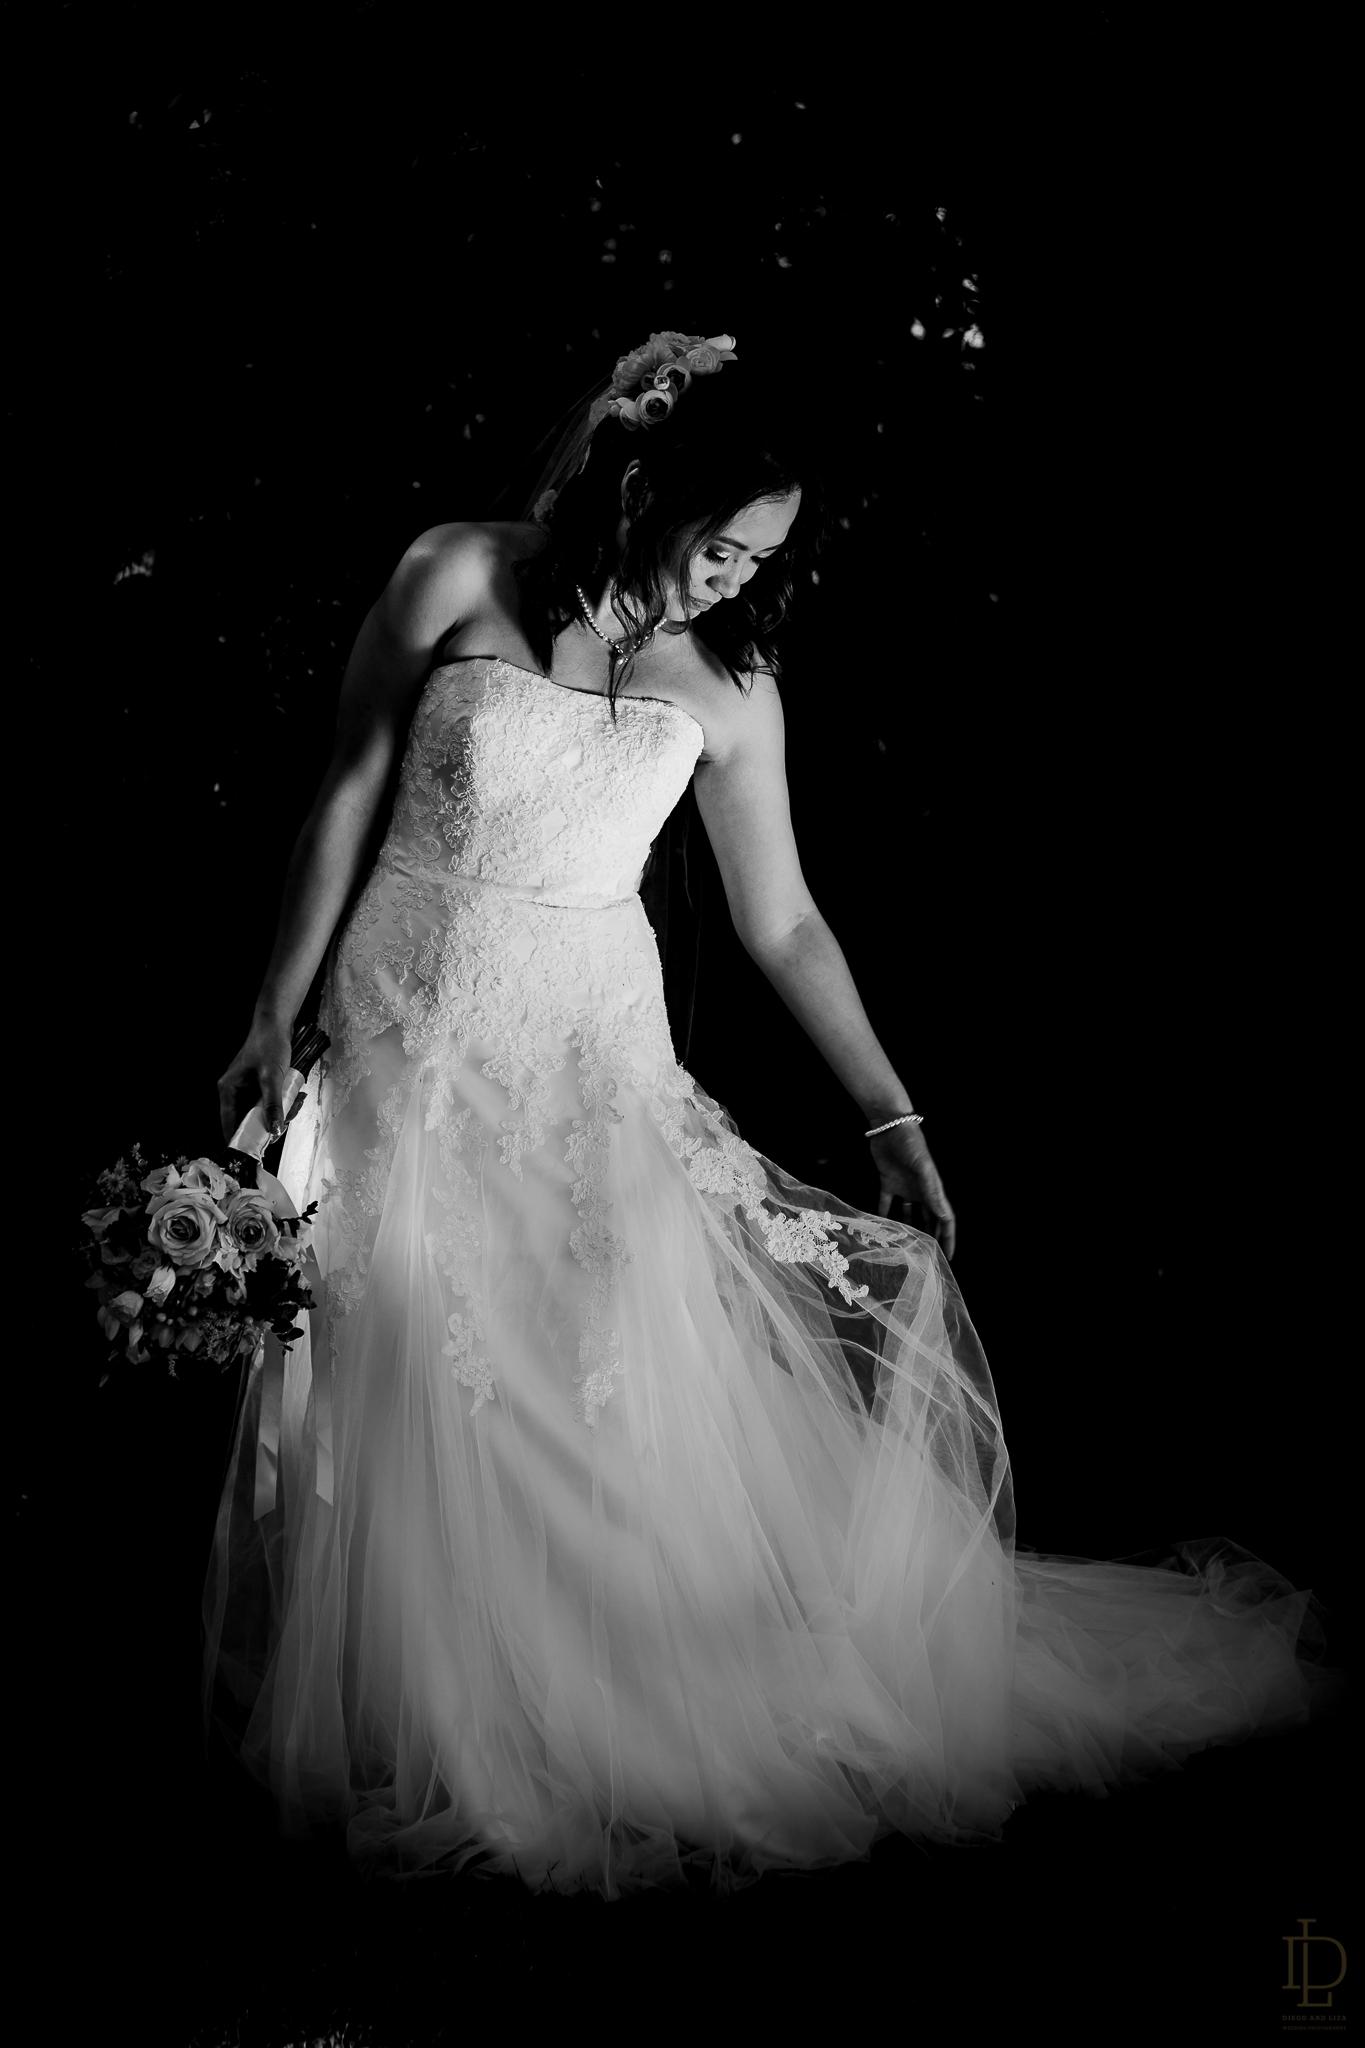 Toronto-wedding-Photograper-26.jpg